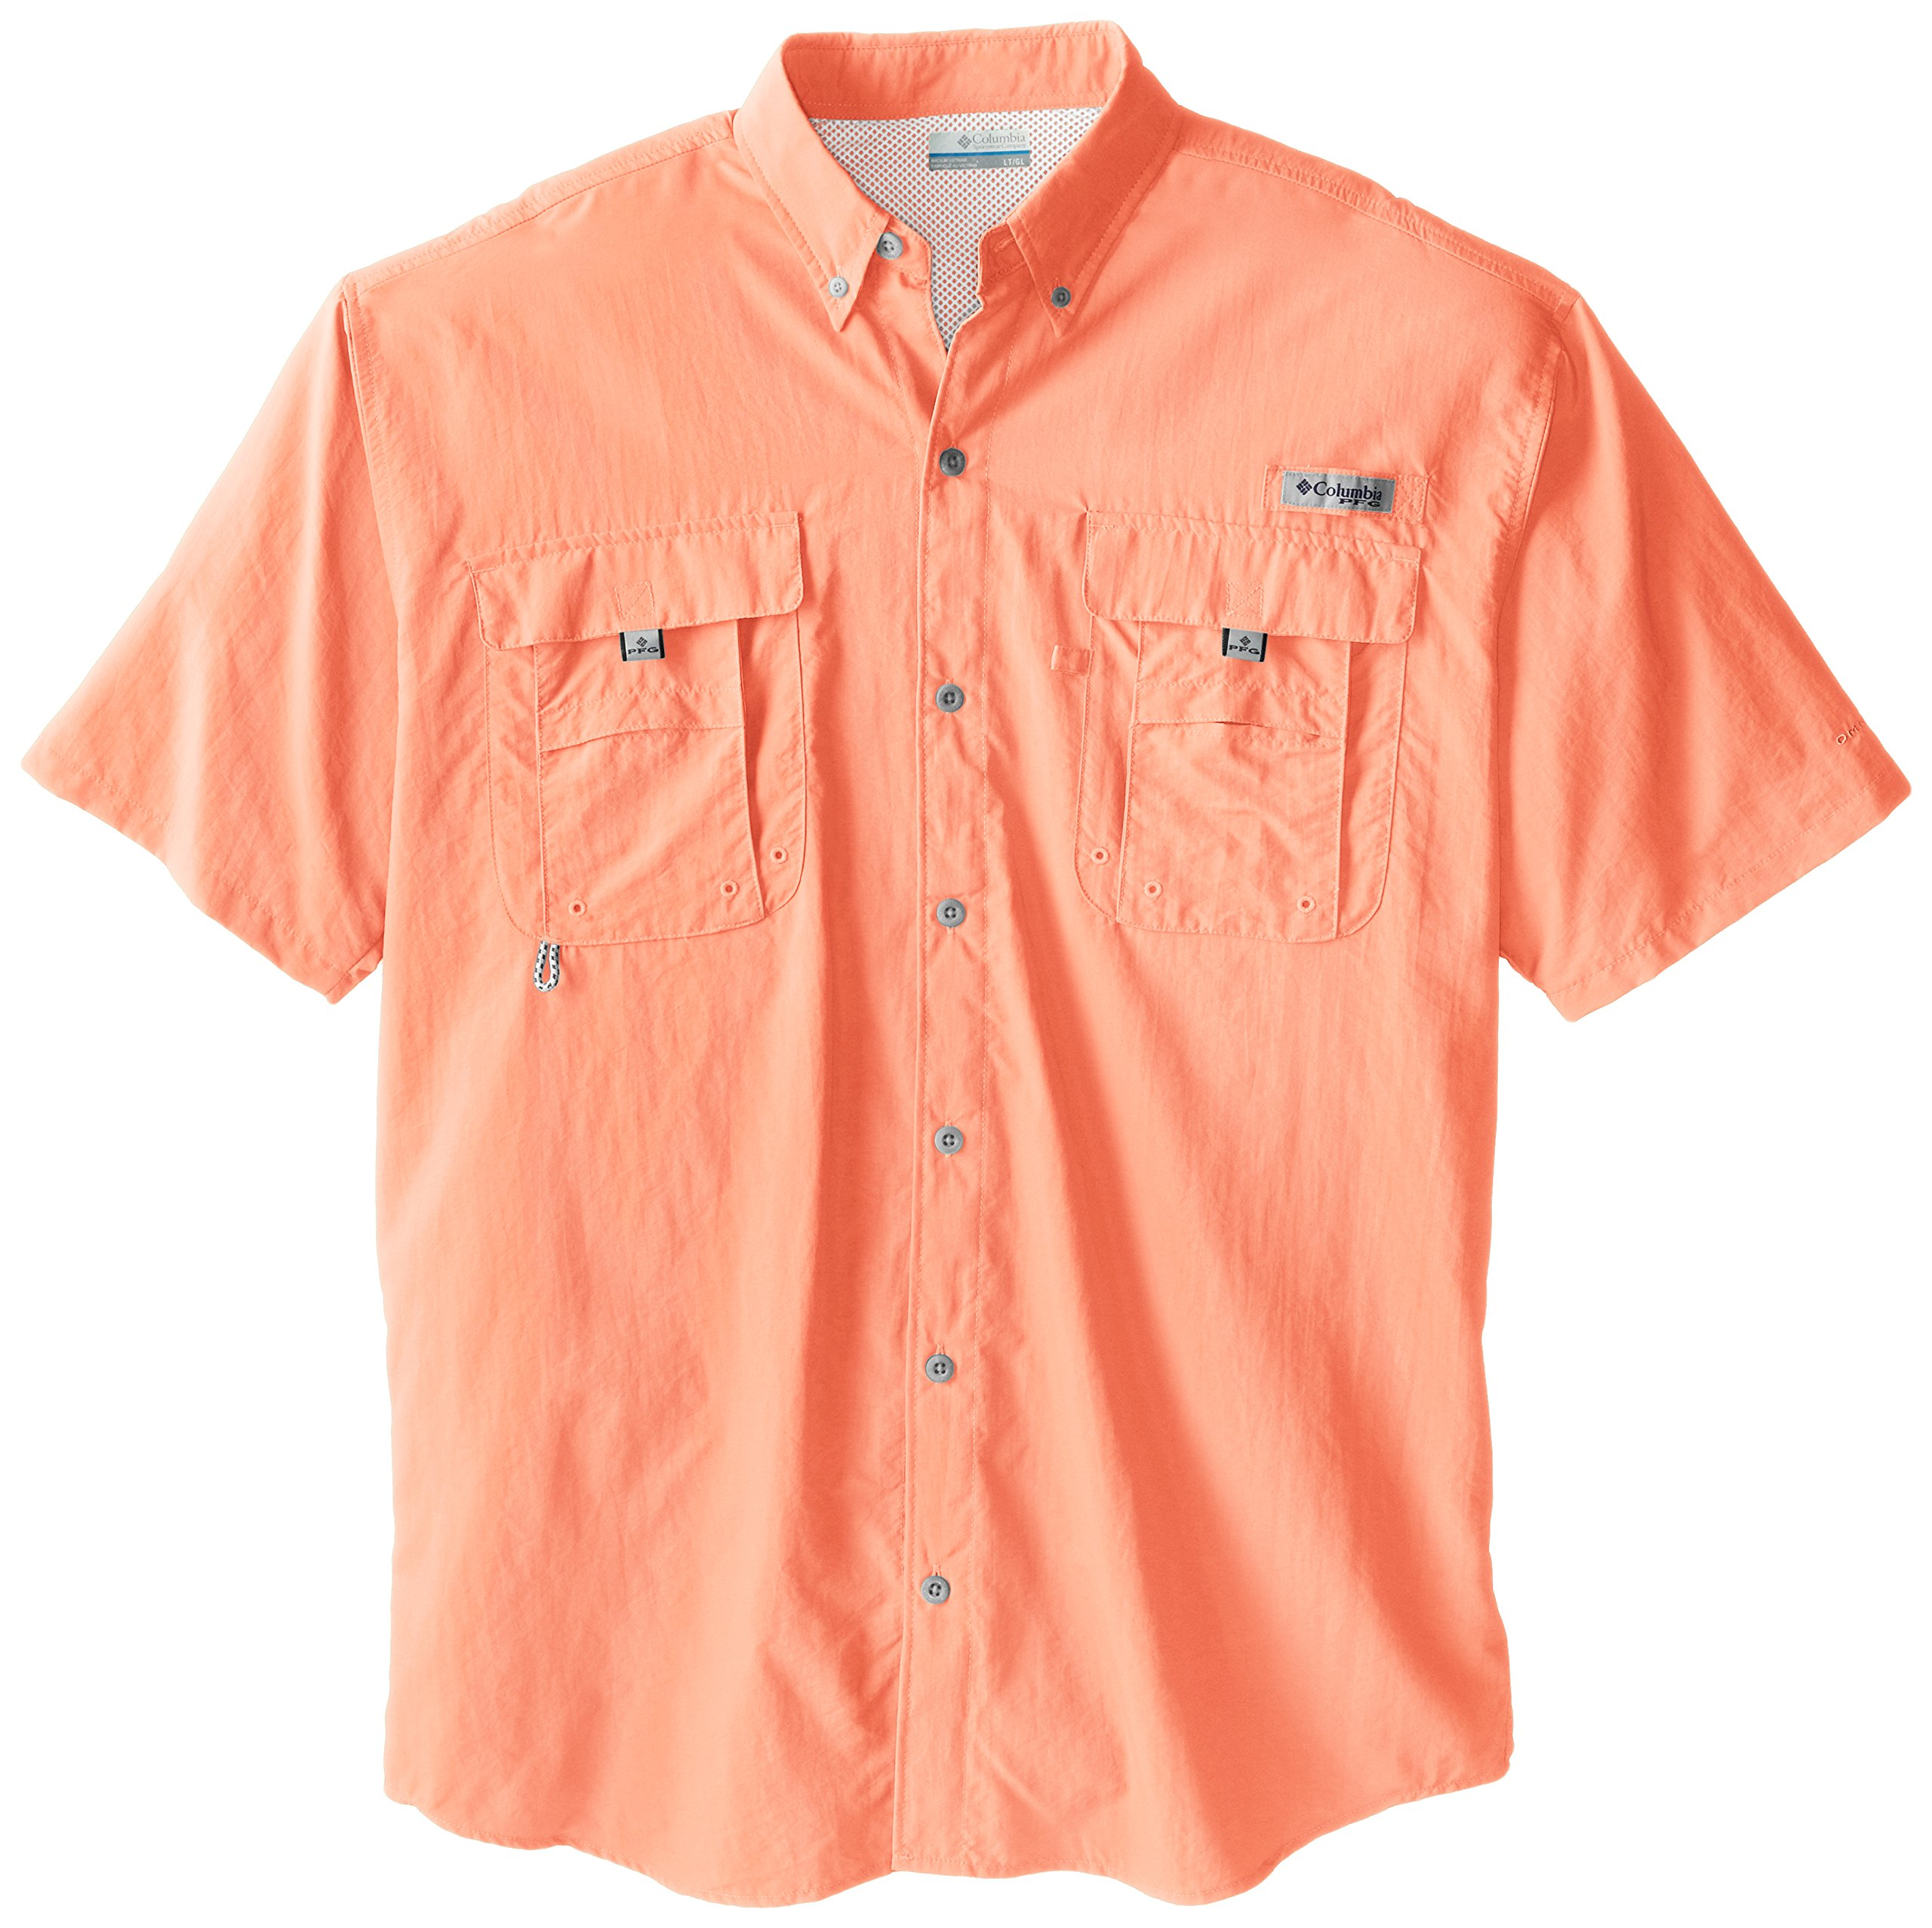 Columbia Men's Bahama II Short Sleeve Shirt, Bright Peach, 2X Tall